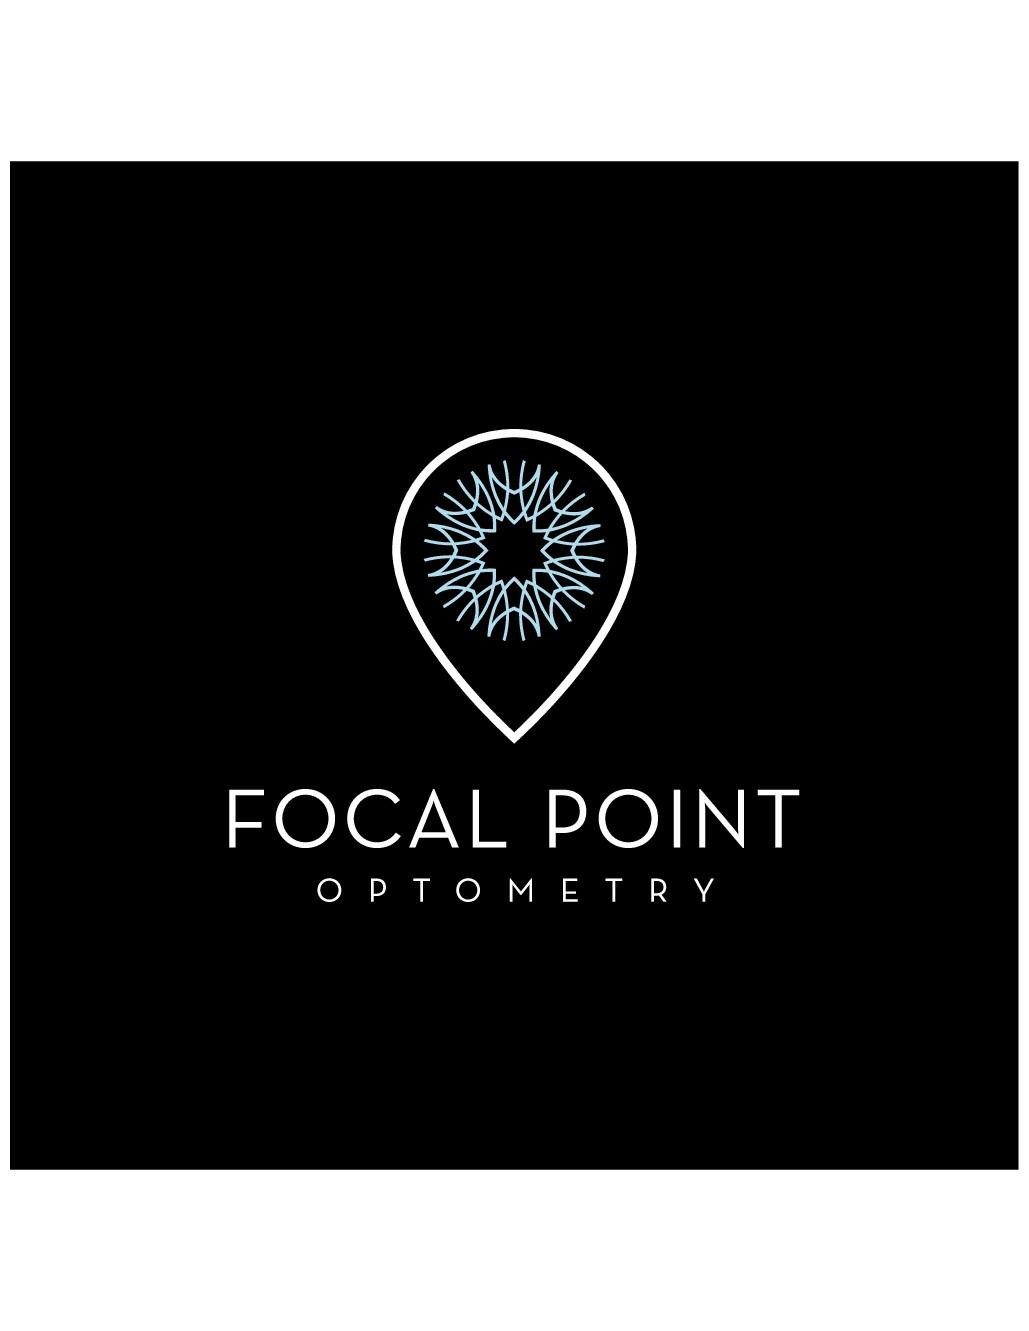 Focal Point Optometry needs eye-catching logo and branding!